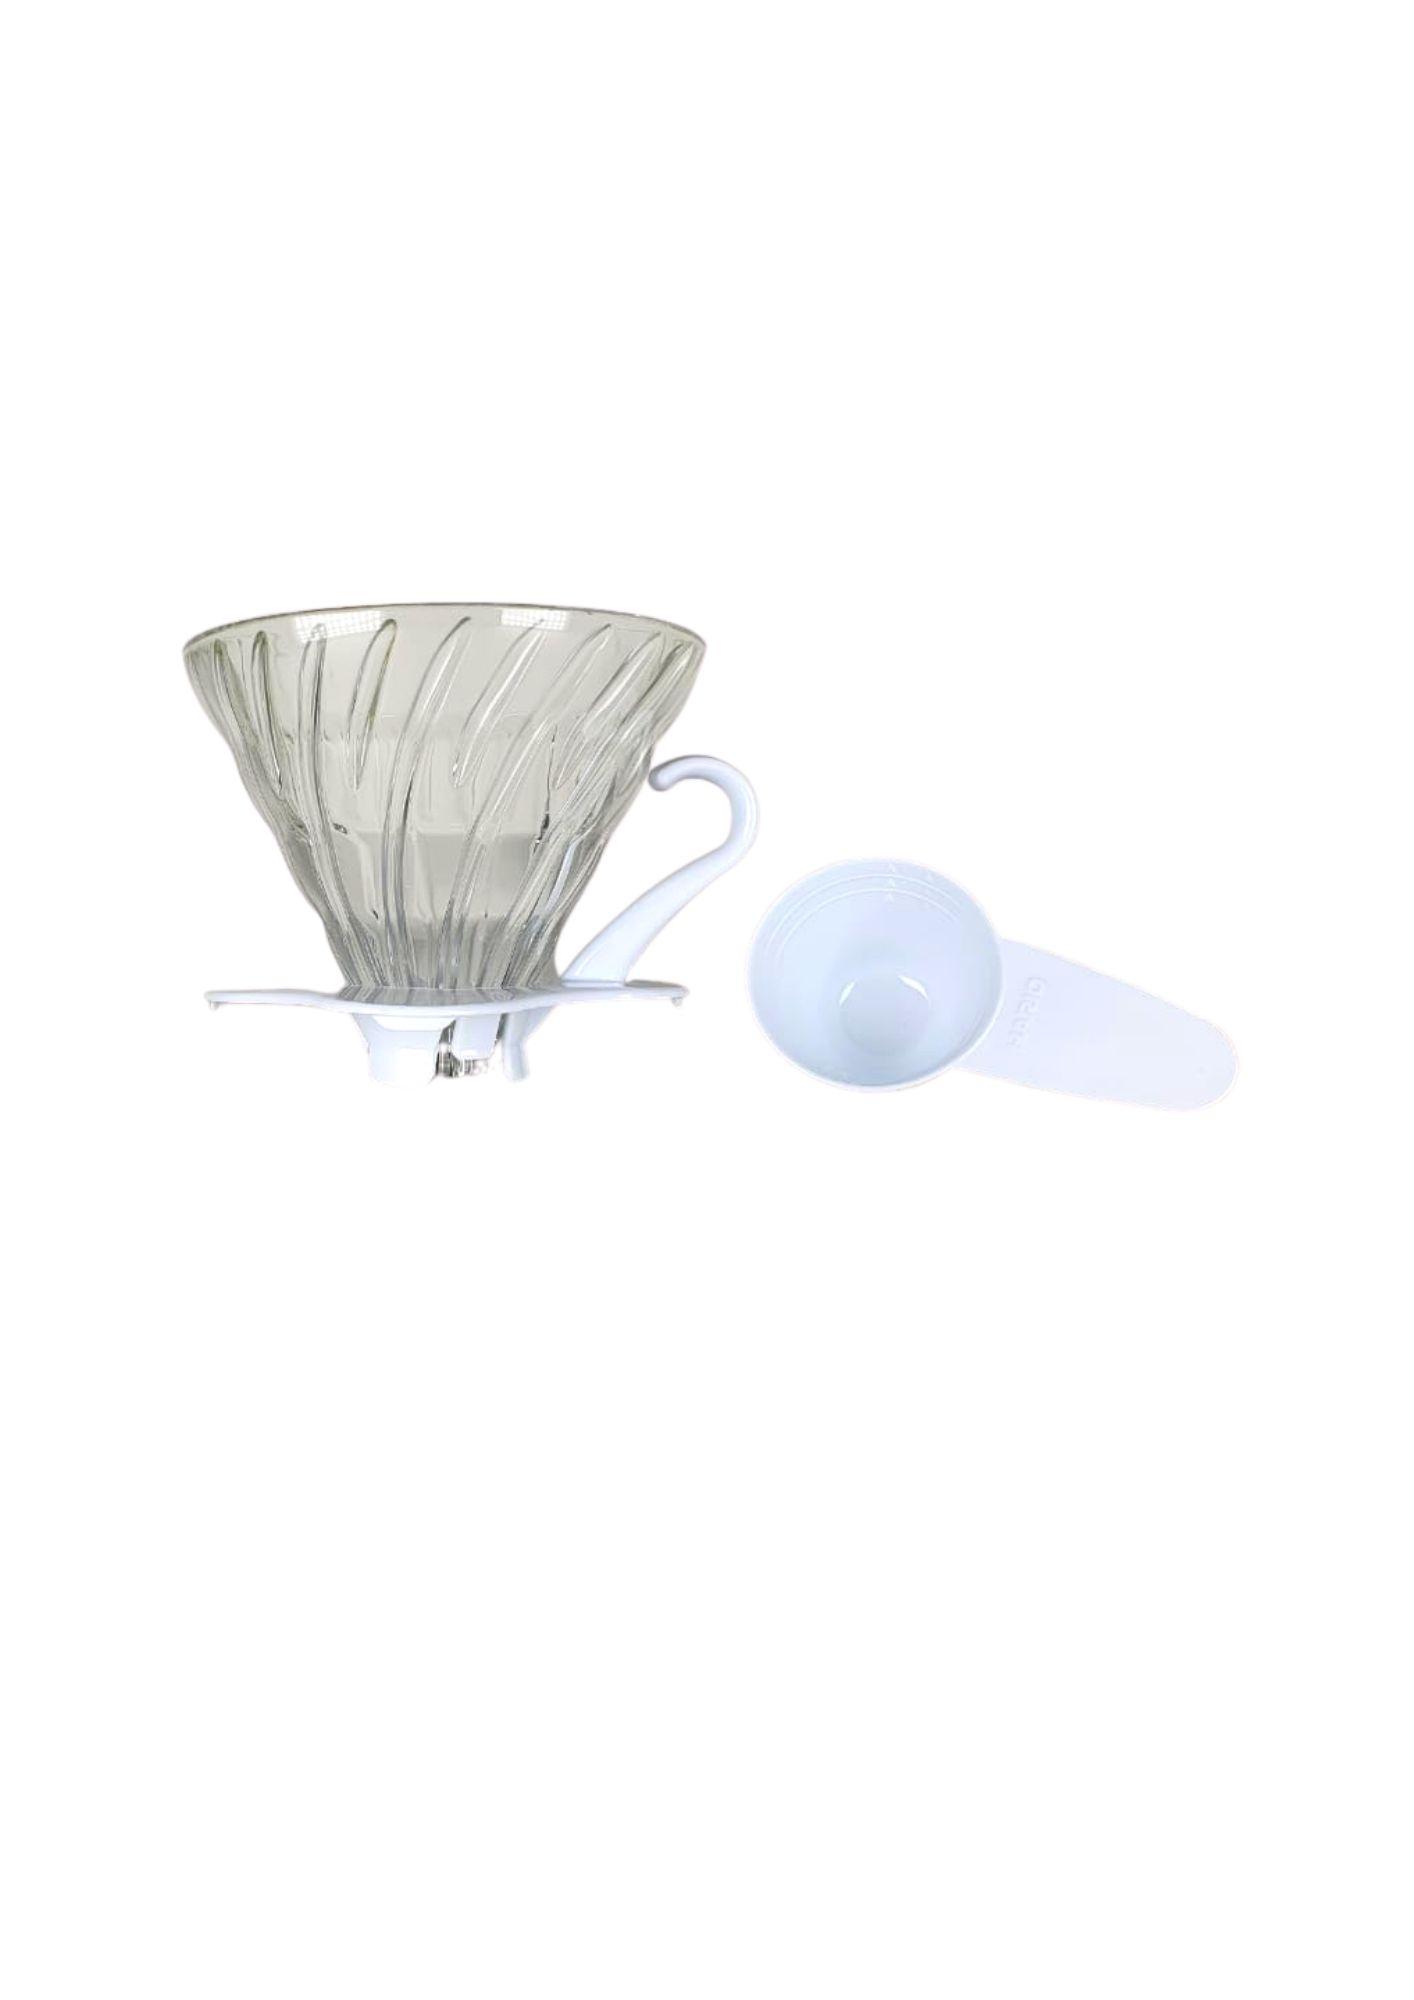 HARIO COADOR CAFE V60 02 VDG-02 WHITE